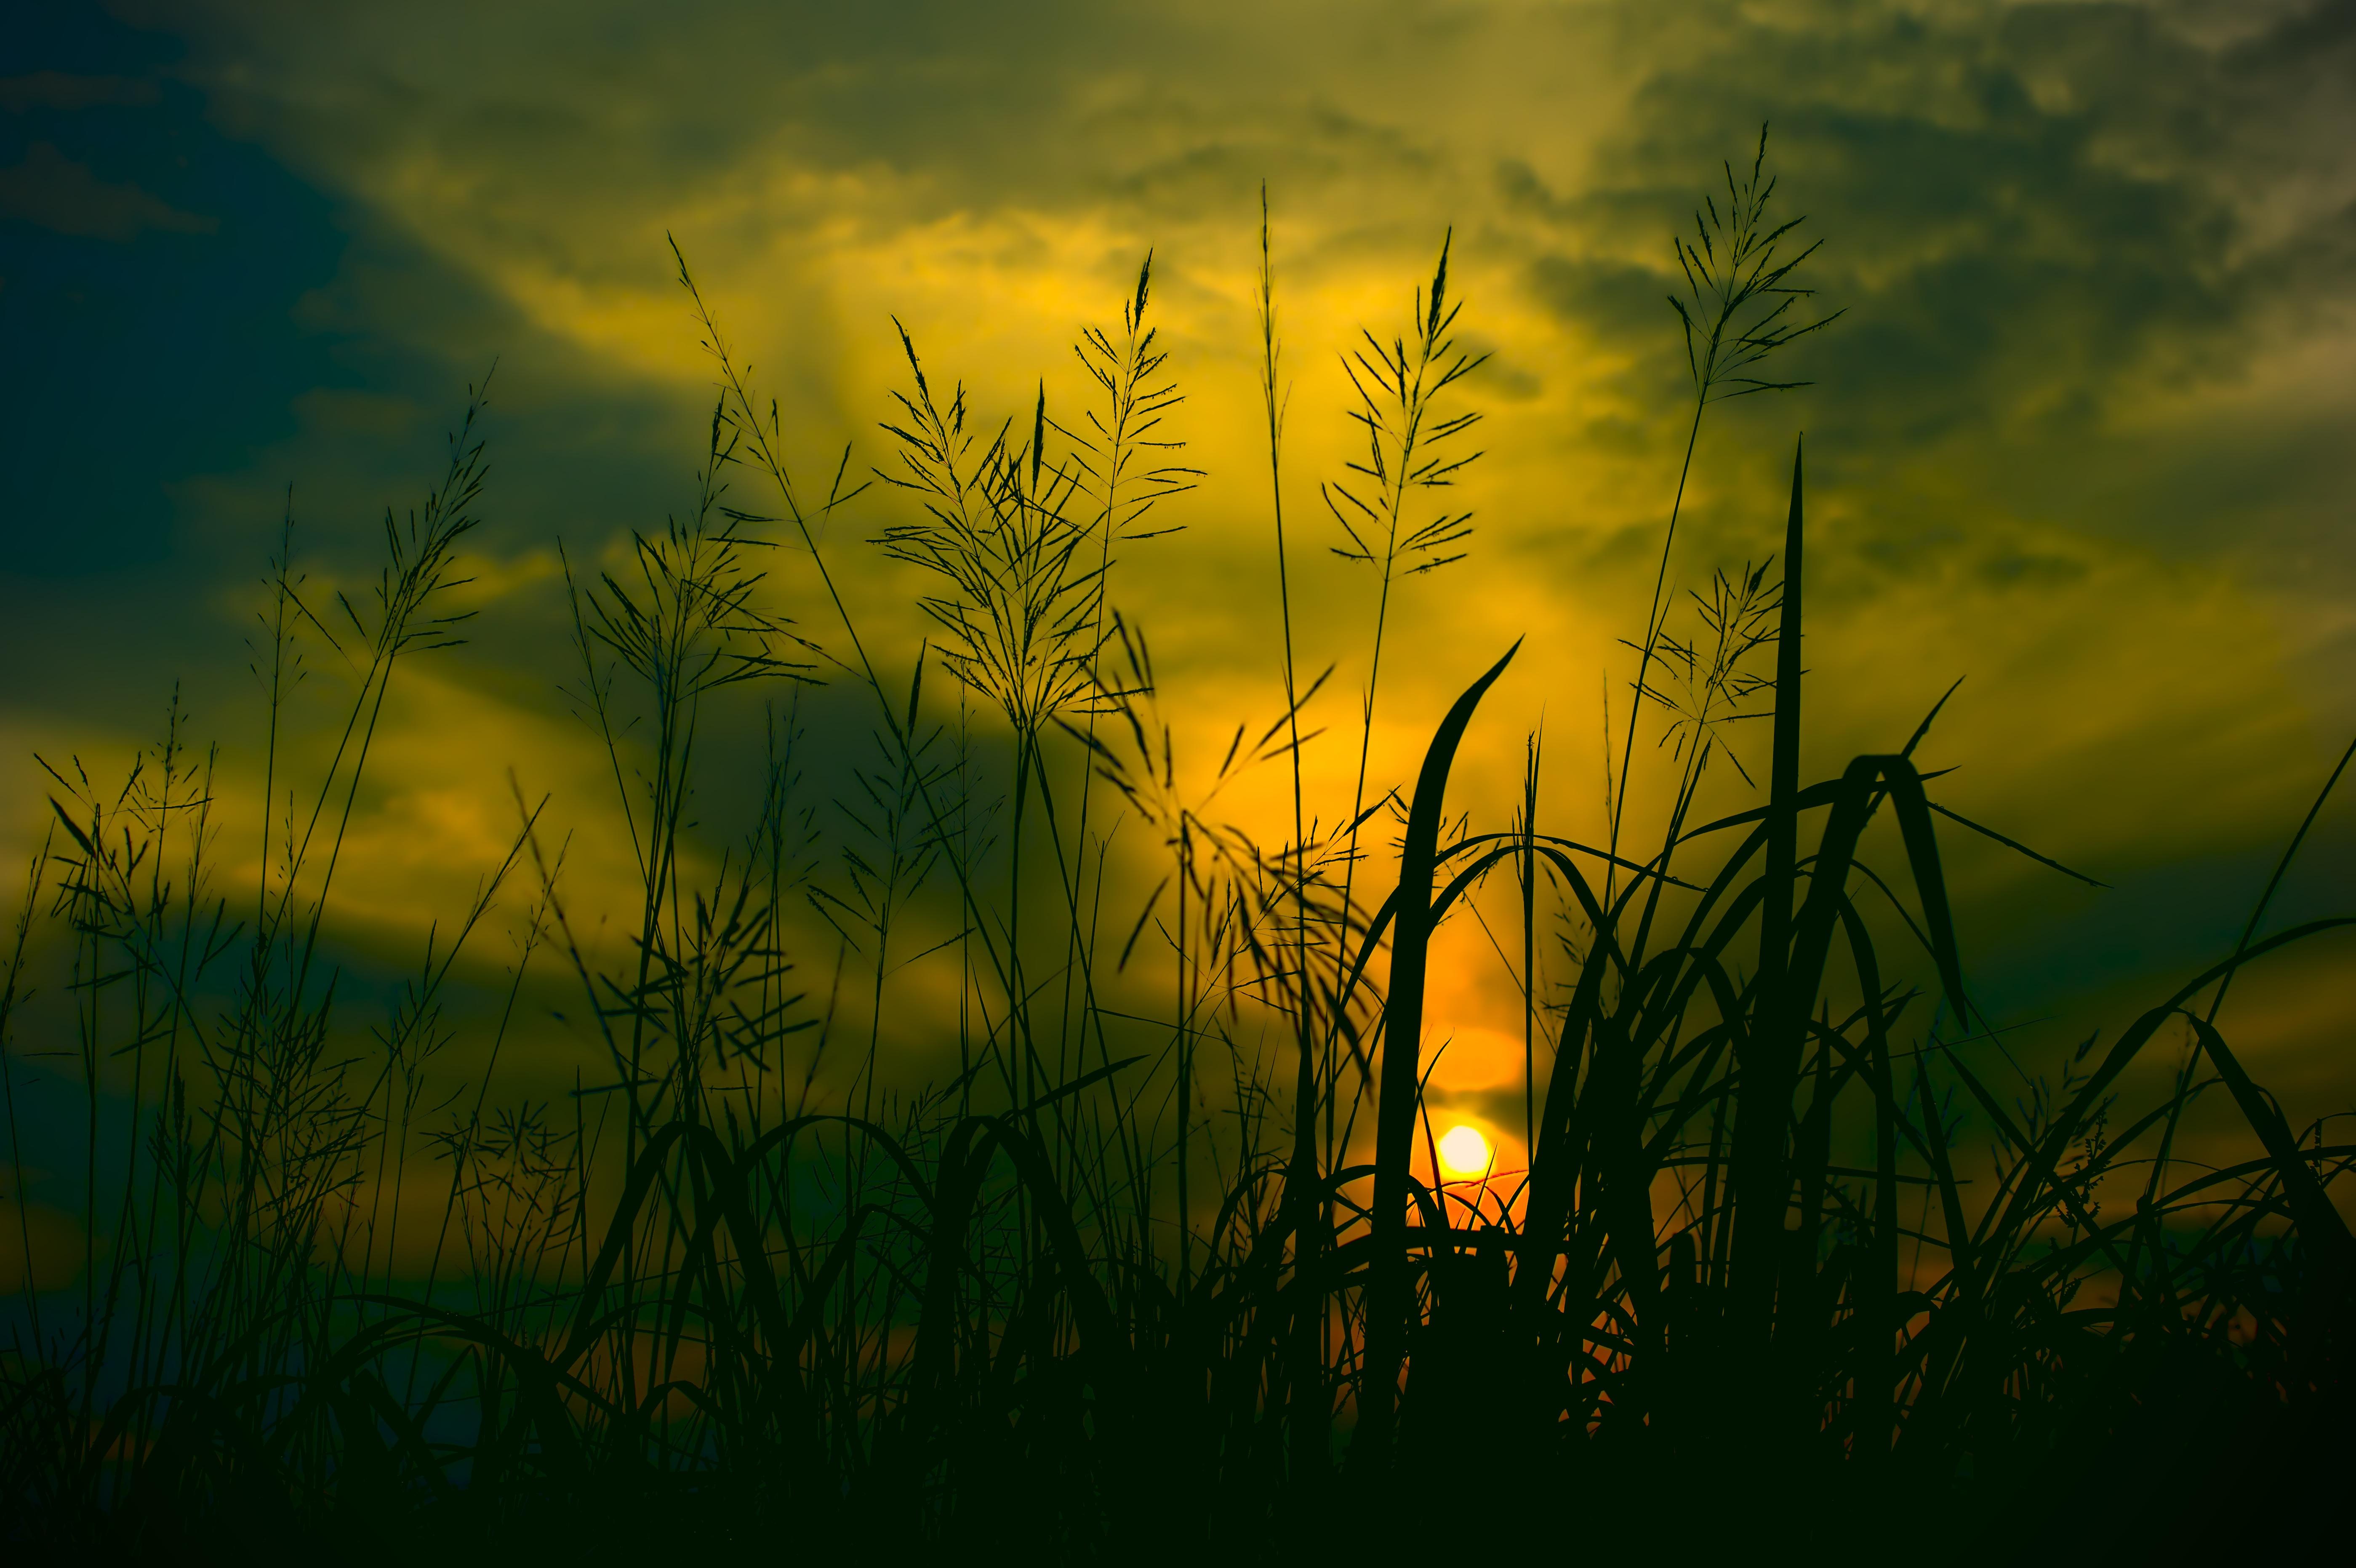 Фотография Силуэт Природа рассвет и закат траве 5596x3724 силуэта силуэты Рассветы и закаты Трава